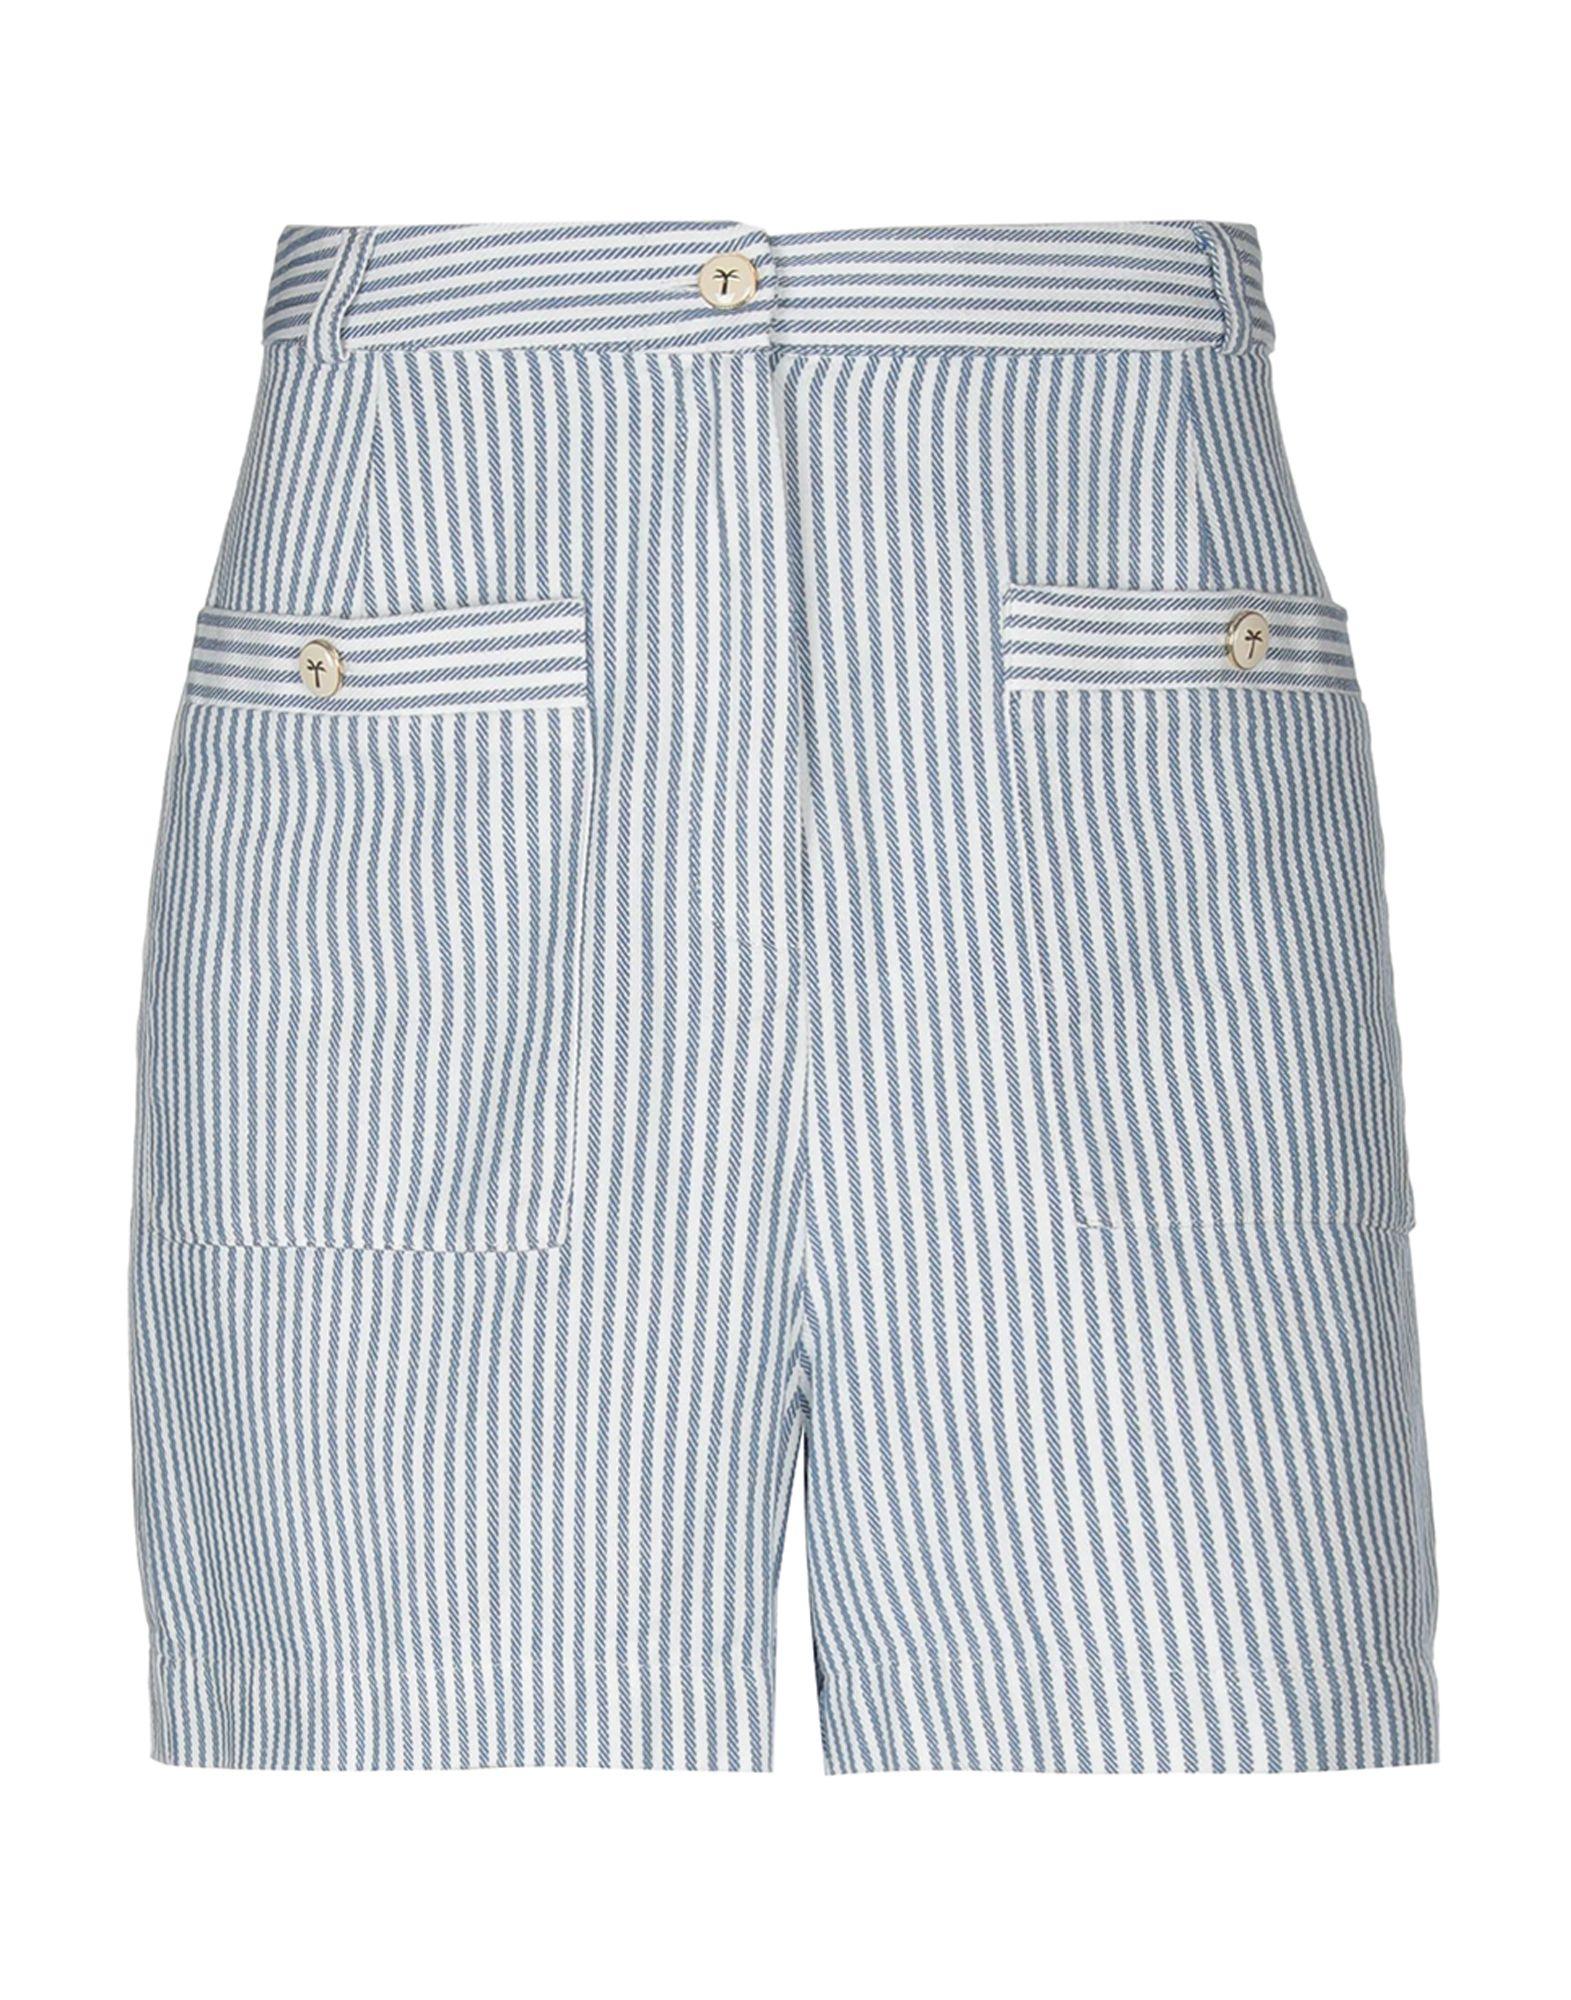 DES PETITS HAUTS Повседневные шорты des petits hauts повседневные брюки